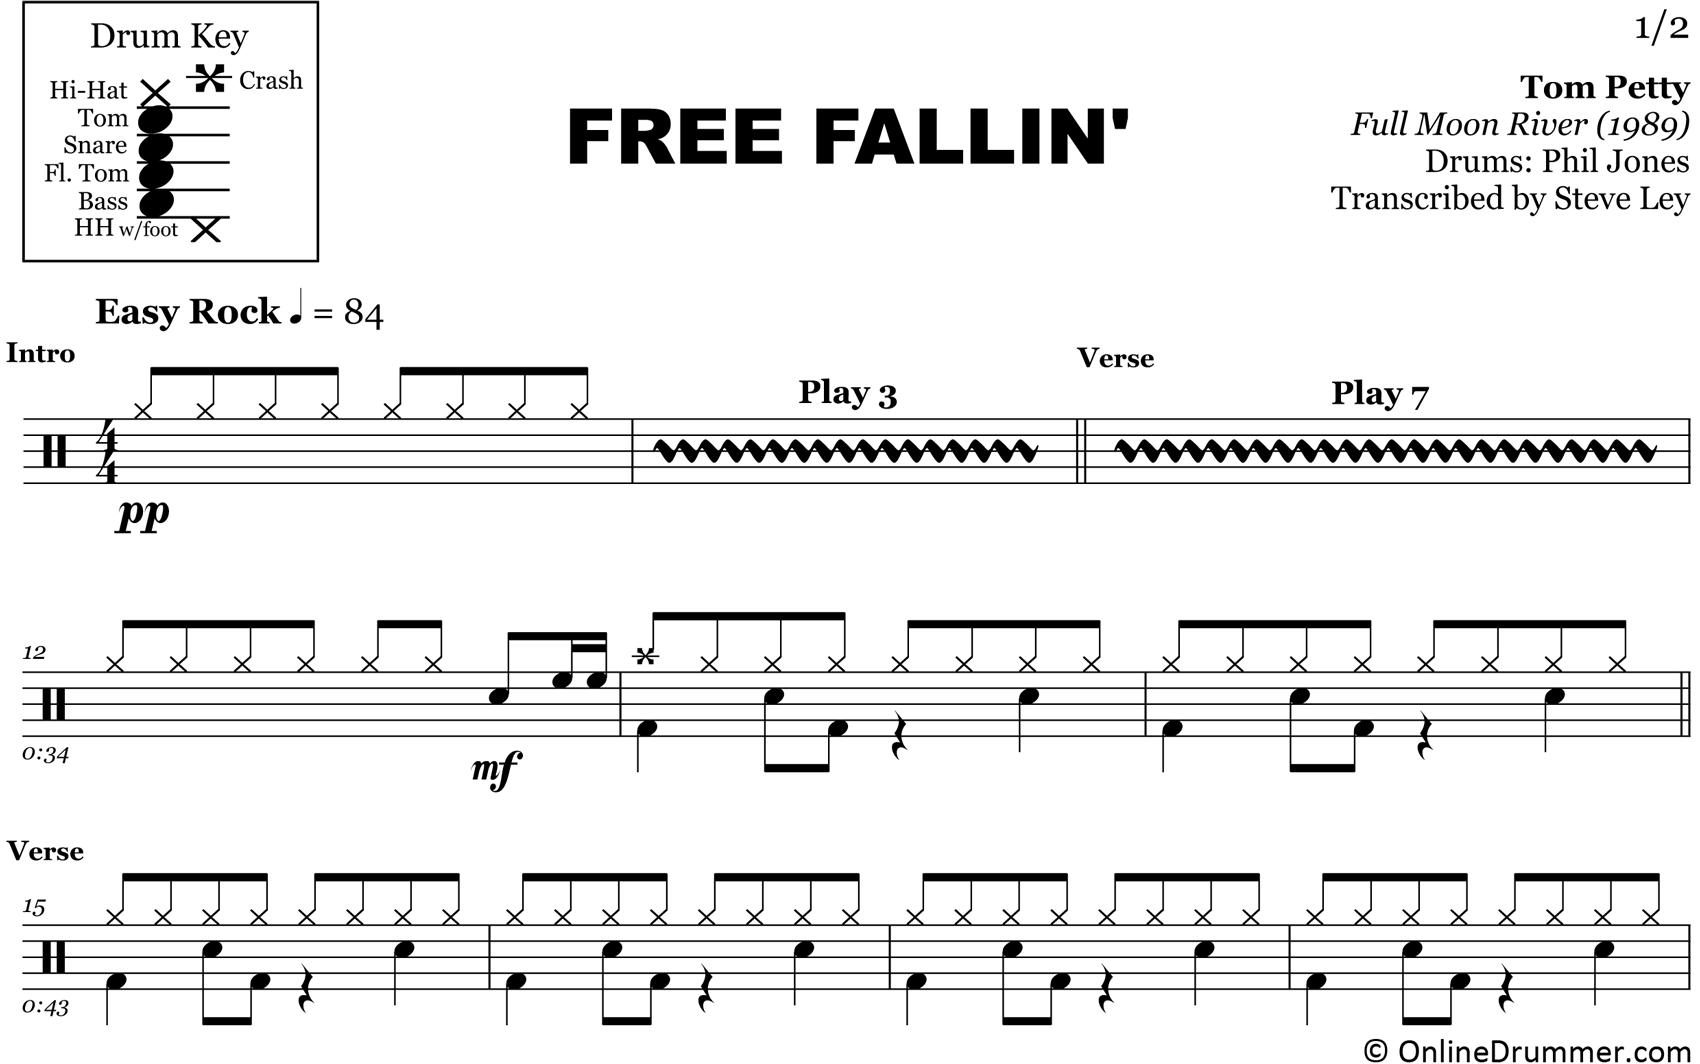 xFree-Fallin-Tom-Petty-Drum-Sheet-Music.png.pagespeed.ic.3nnX0wpLwk.jpg